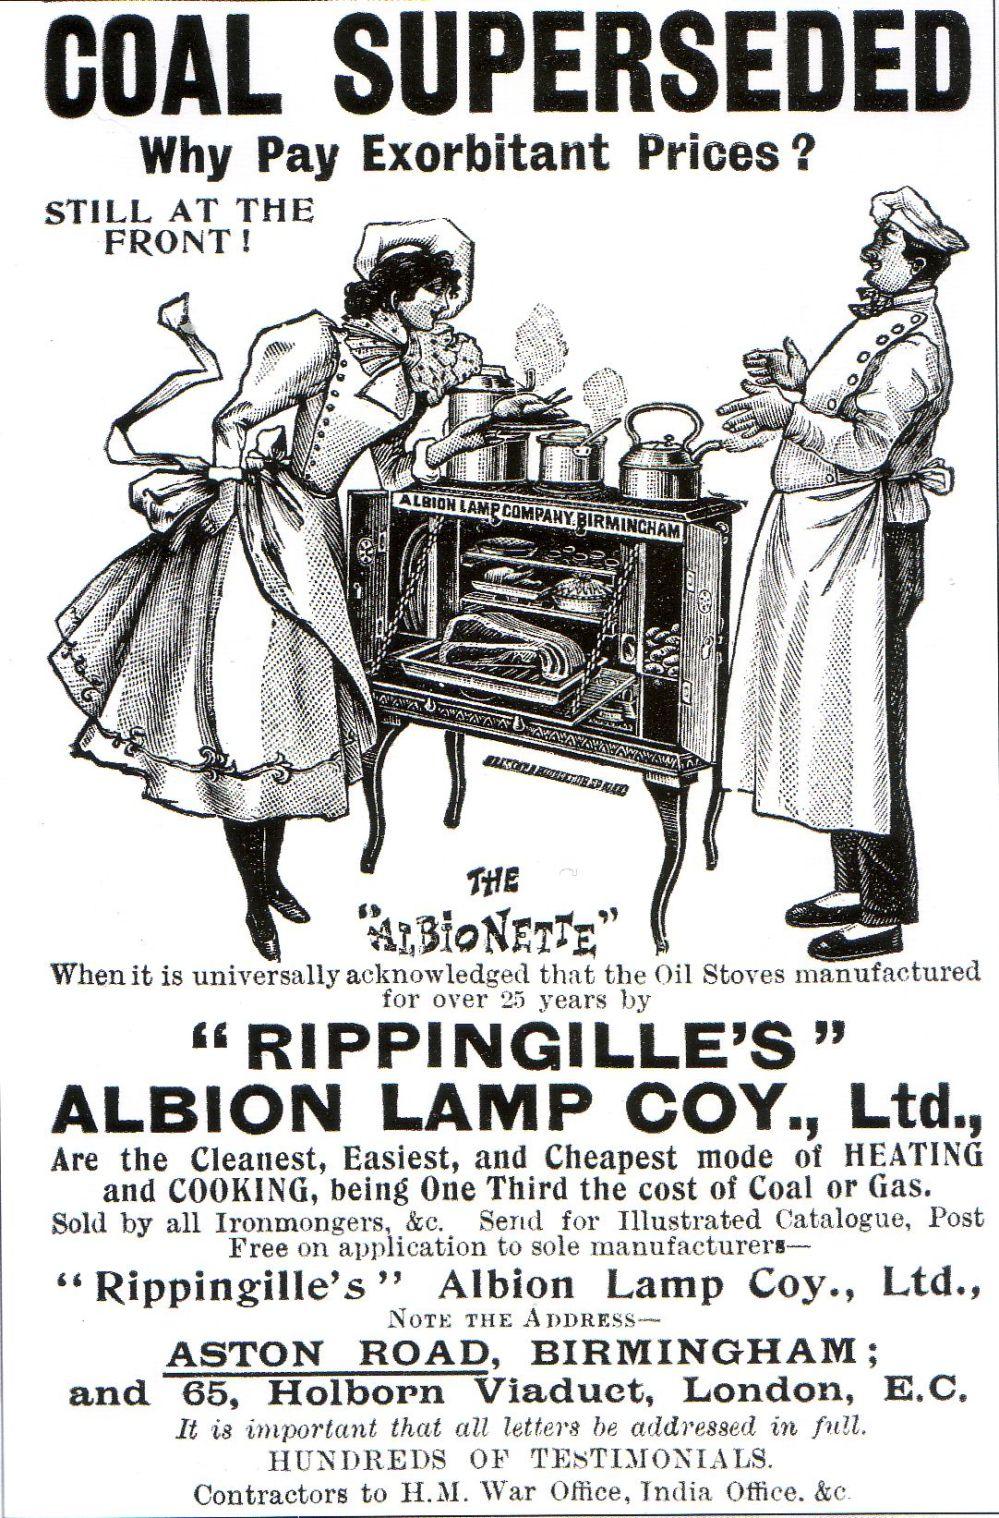 Rippingille Albion Lamp Coy, advert ca. 1900.